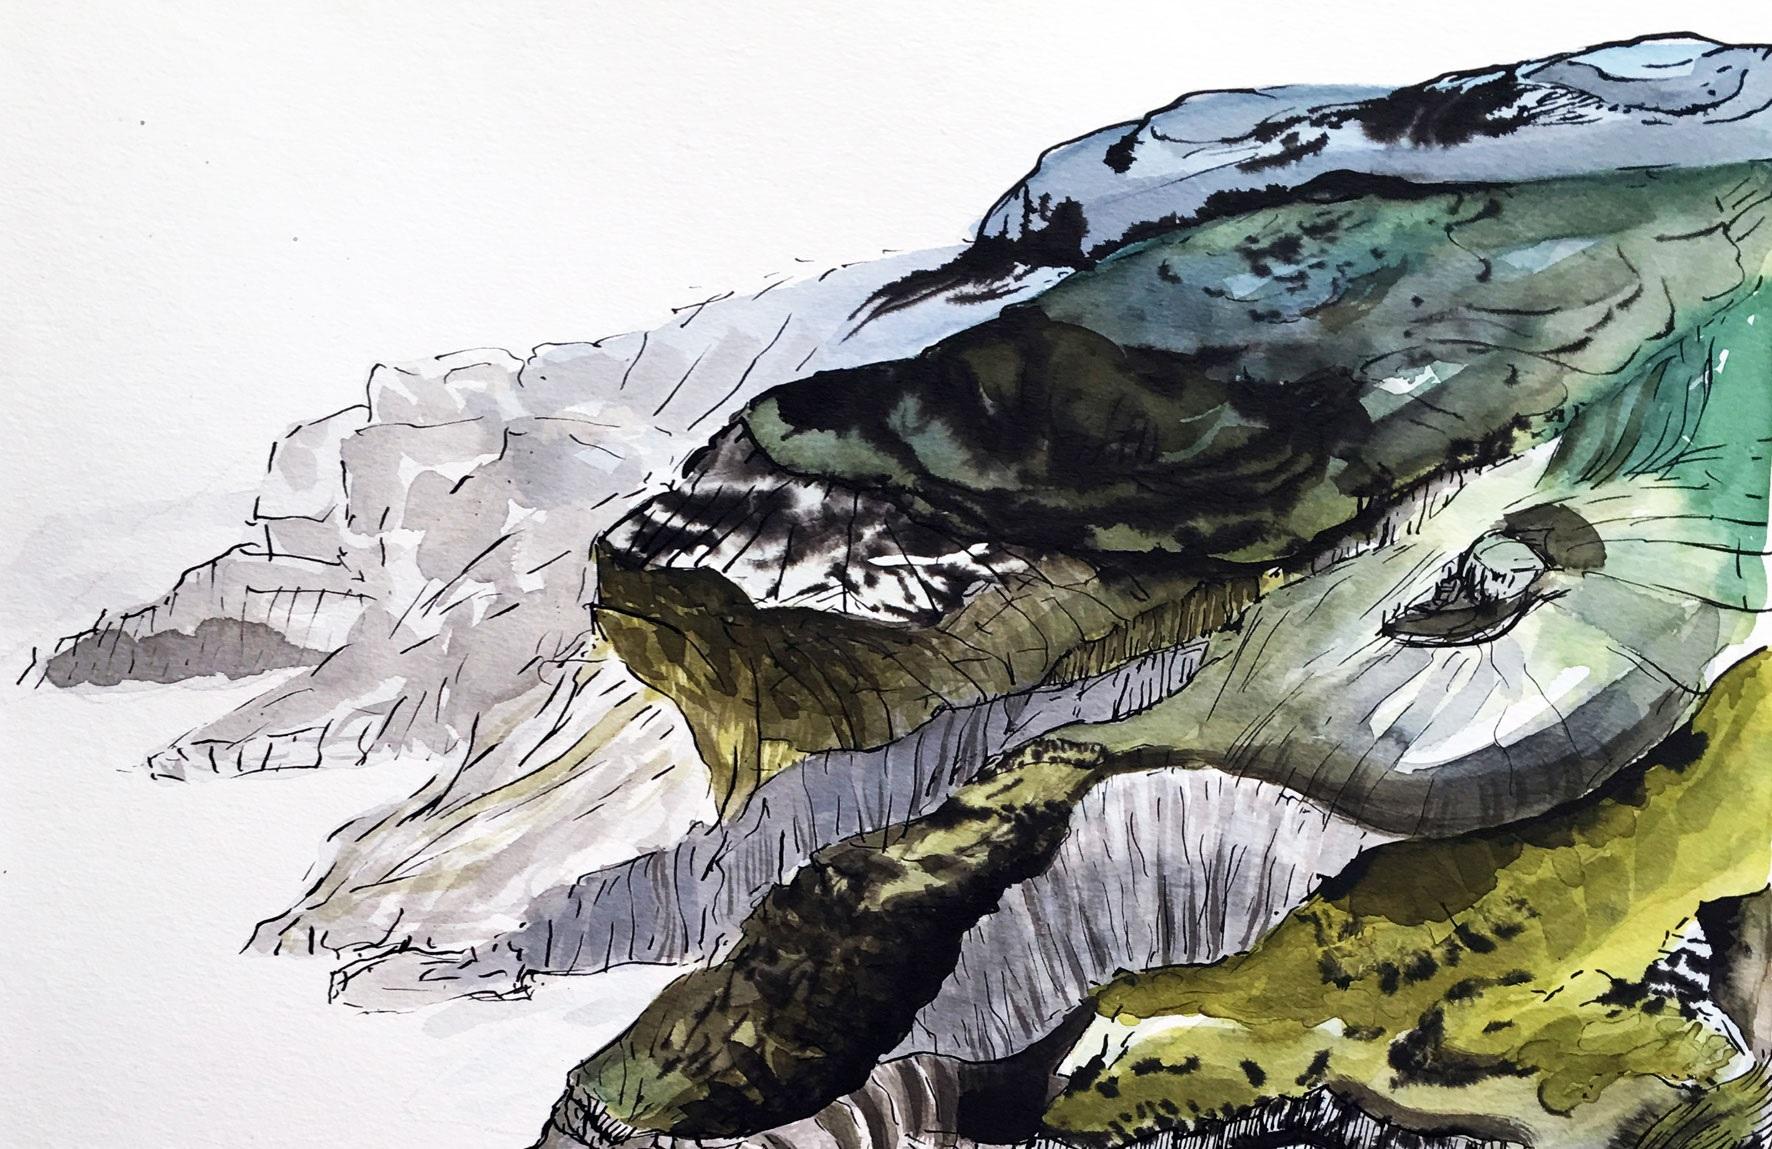 Kunst trifft Steuer XXVII - Sylvia Krieg - Homecoming - Hoch auf den Klippen Bearas, 2018, Tusche & Aquarell auf Papier, 42 x 56 cm (Ausschnitt)